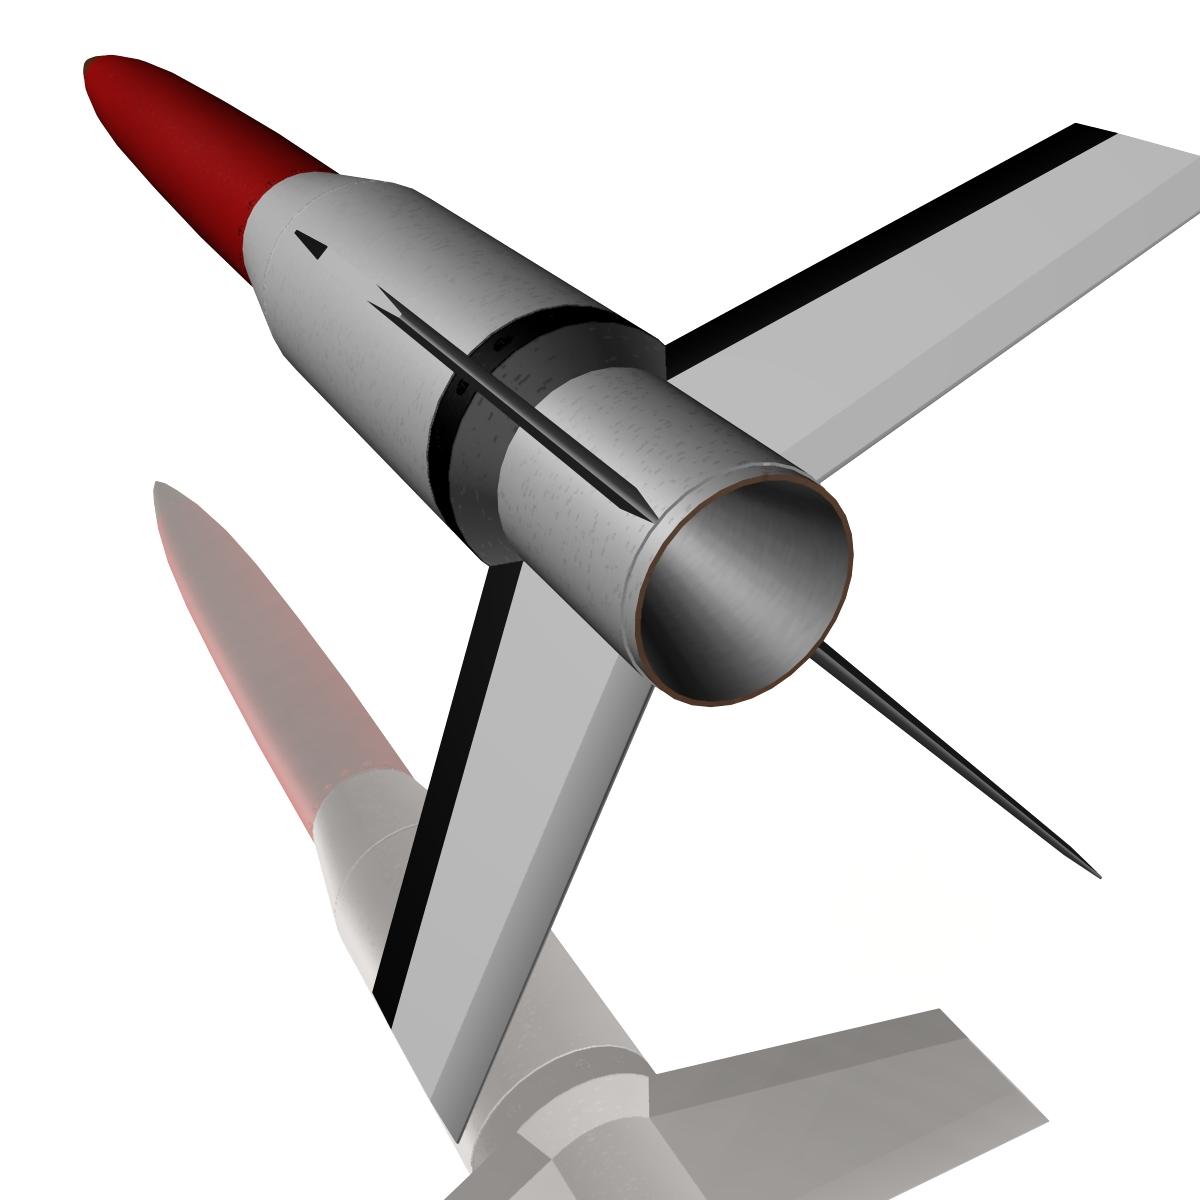 Astrobee 200 Rocket 3d model 3ds dxf fbx blend cob dae X   obj 165947